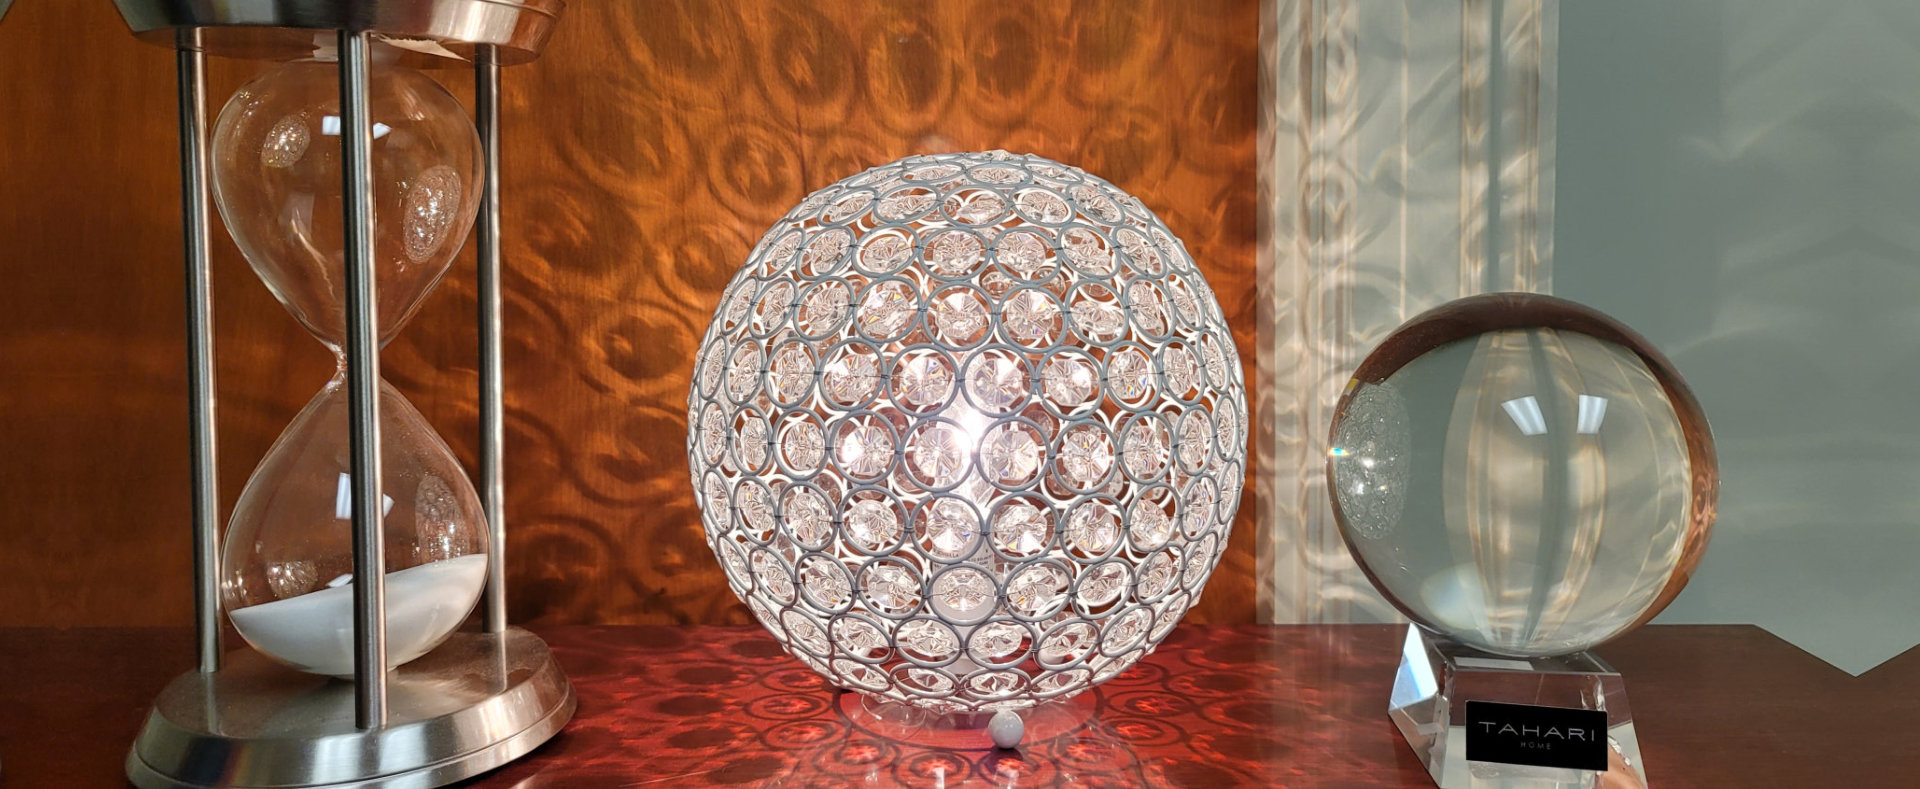 hourglass, glowing ball